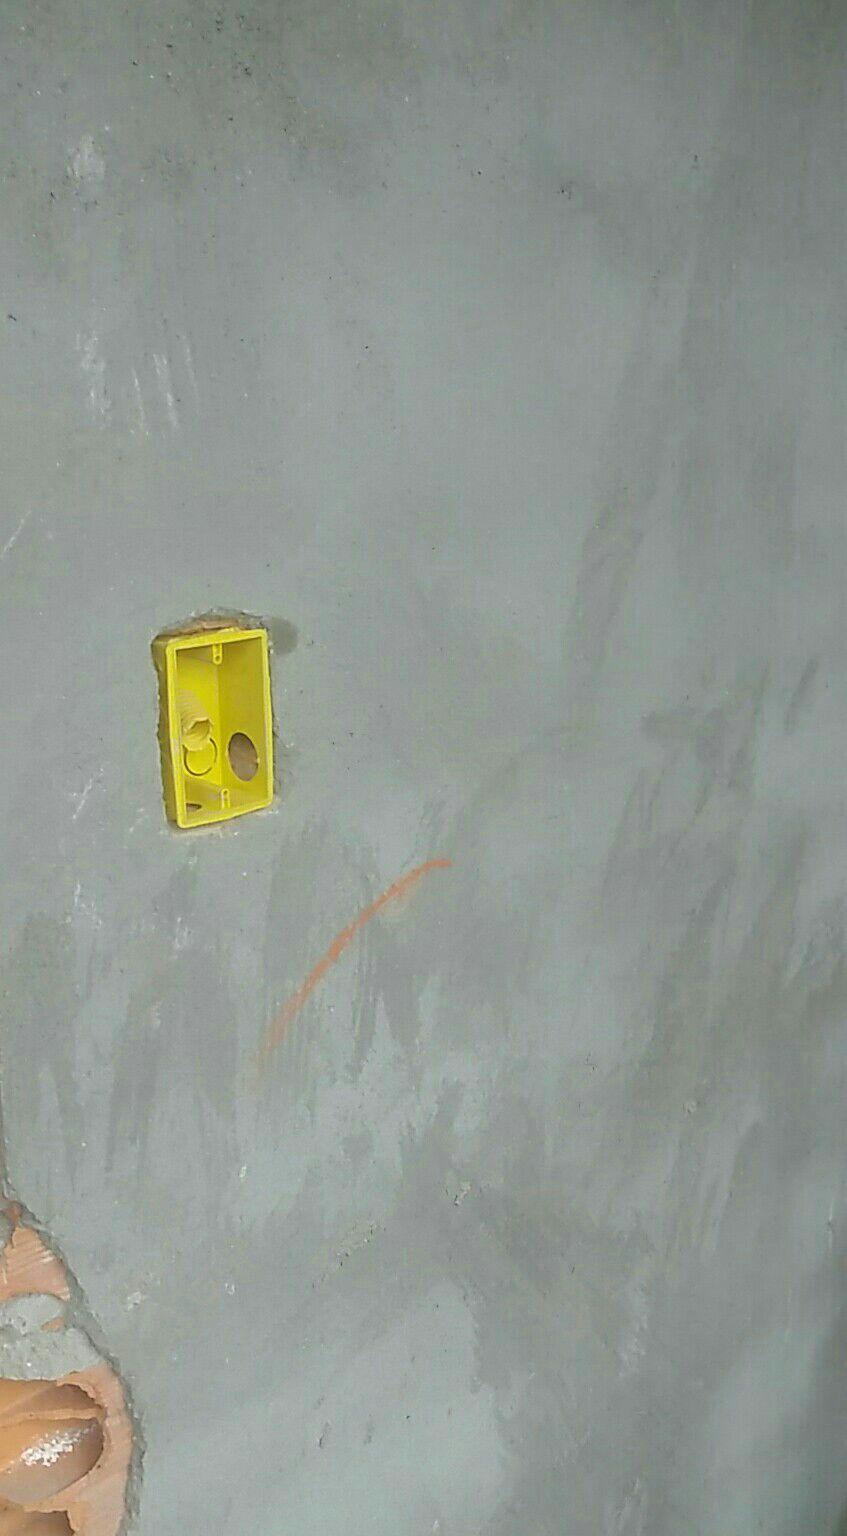 instalacao de caixas elétricas